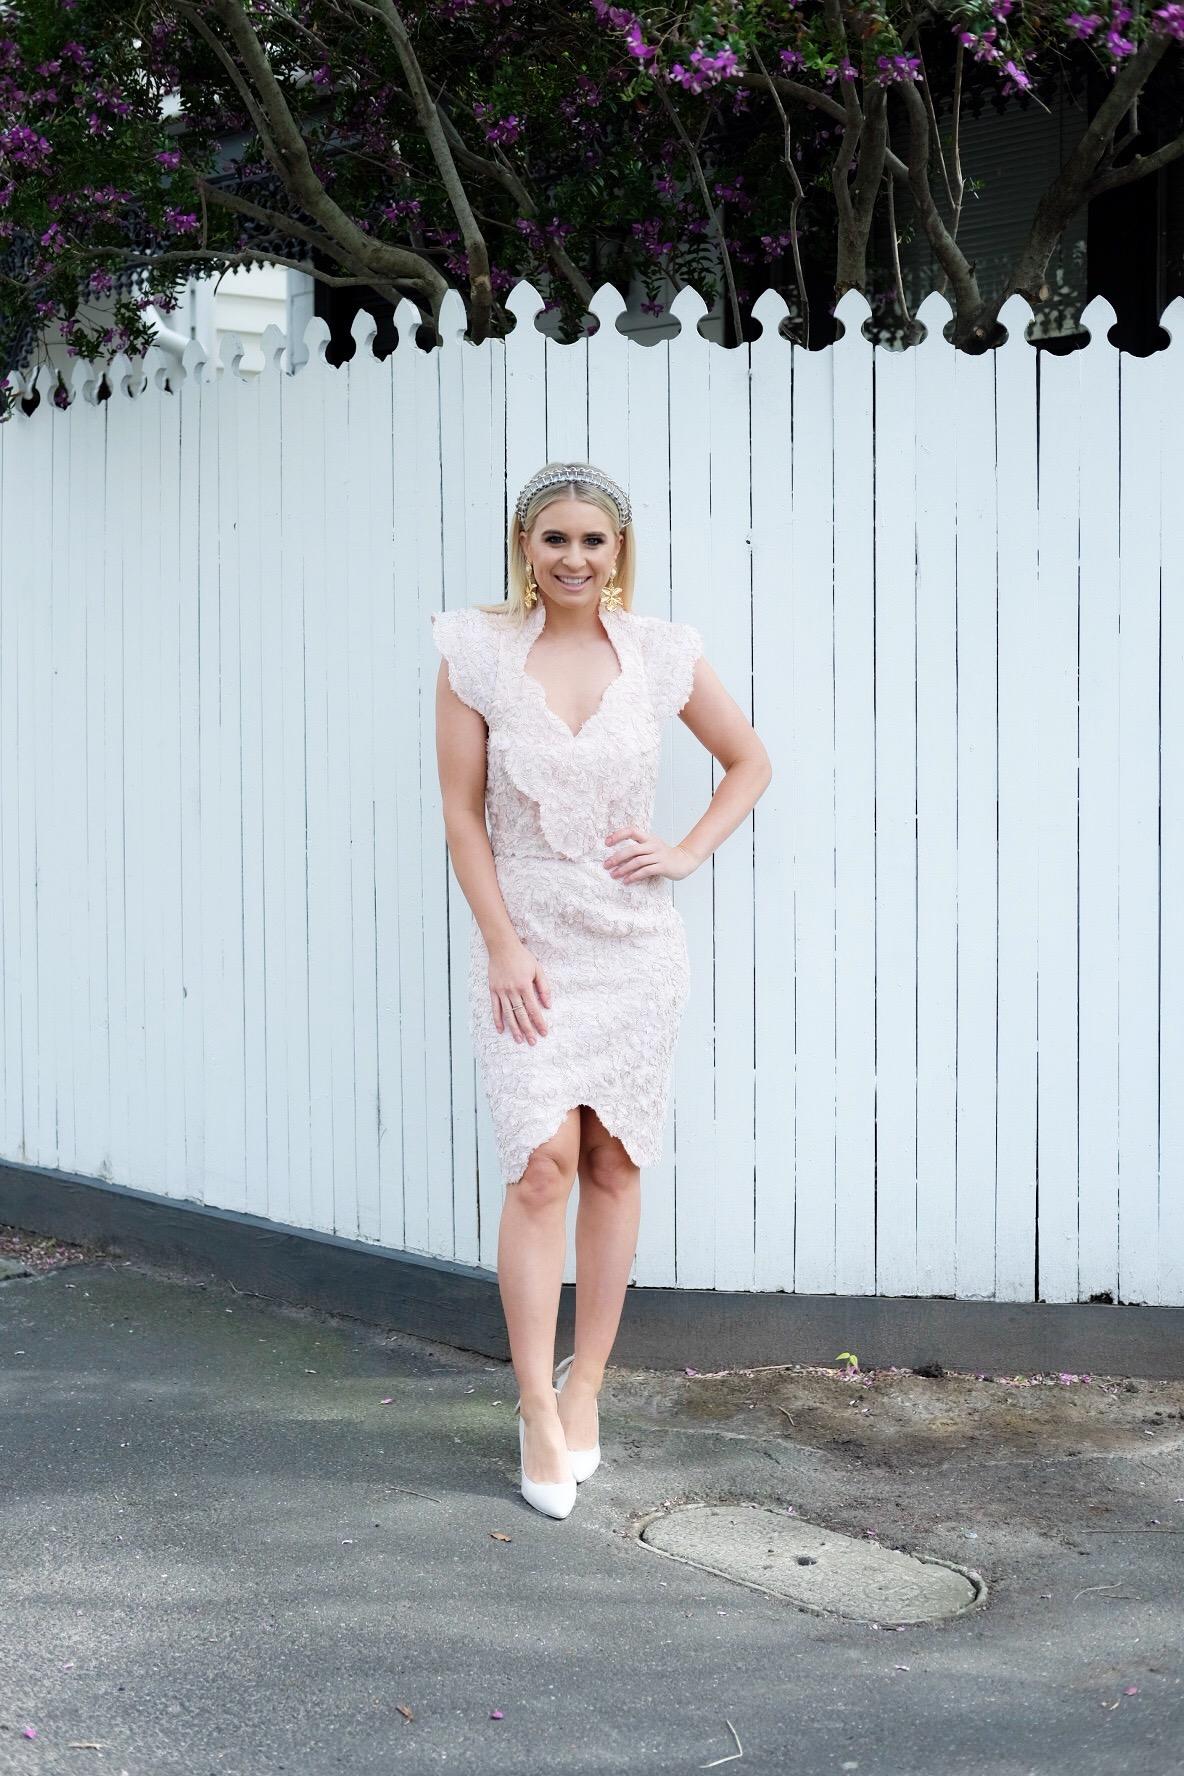 Emma Davenport Channel 7 Reporter - Melbourne Spring Racing Carnival 2017